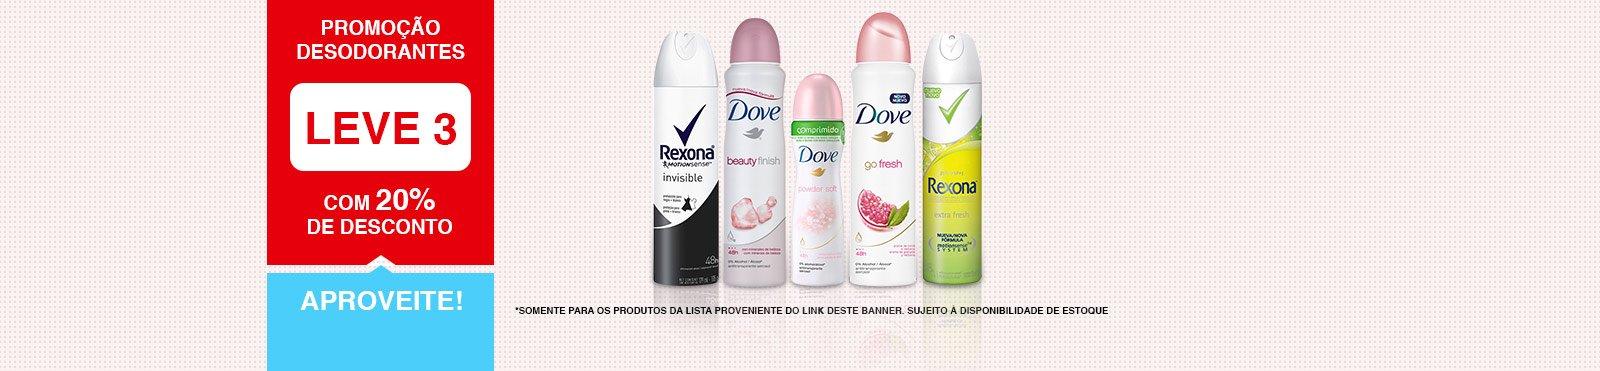 banner-unilever-desodorantes